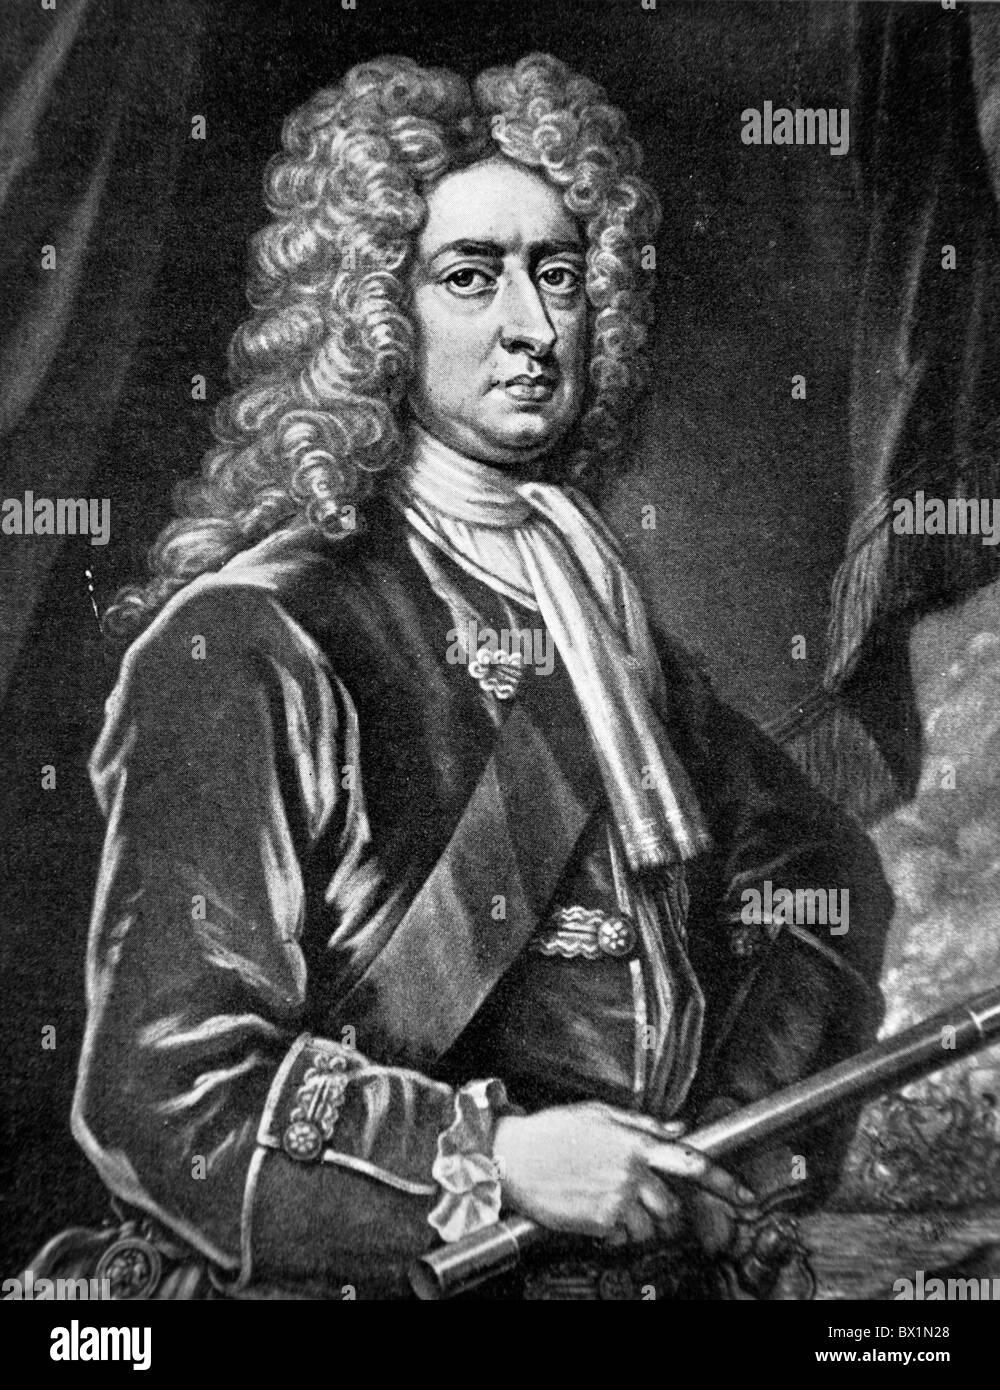 Portrait of John Churchill, Duke of Marlborough, Prince of Mindelheim - Stock Image